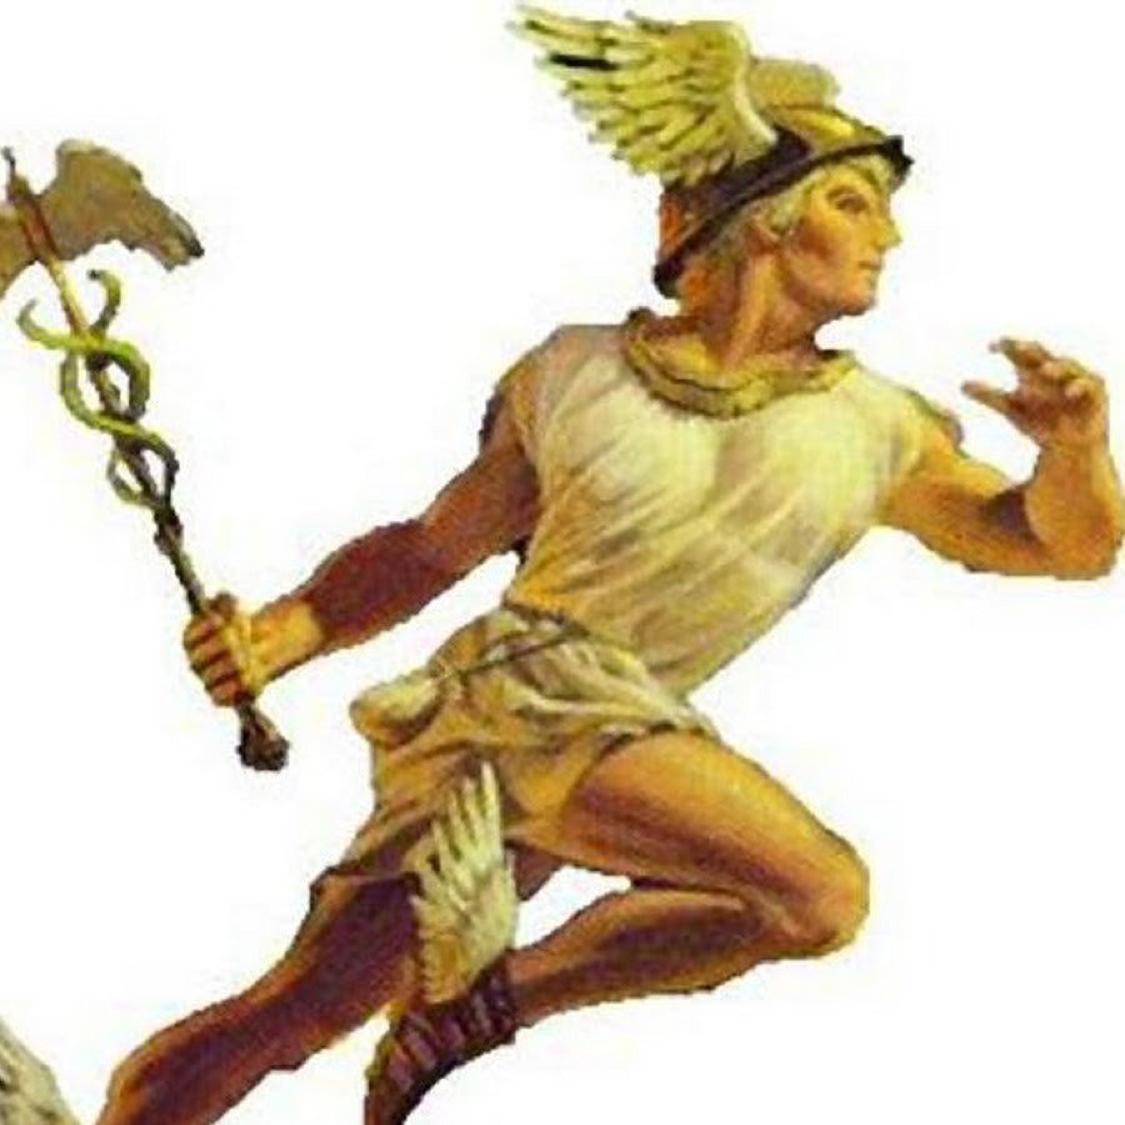 Hermes, el explorador